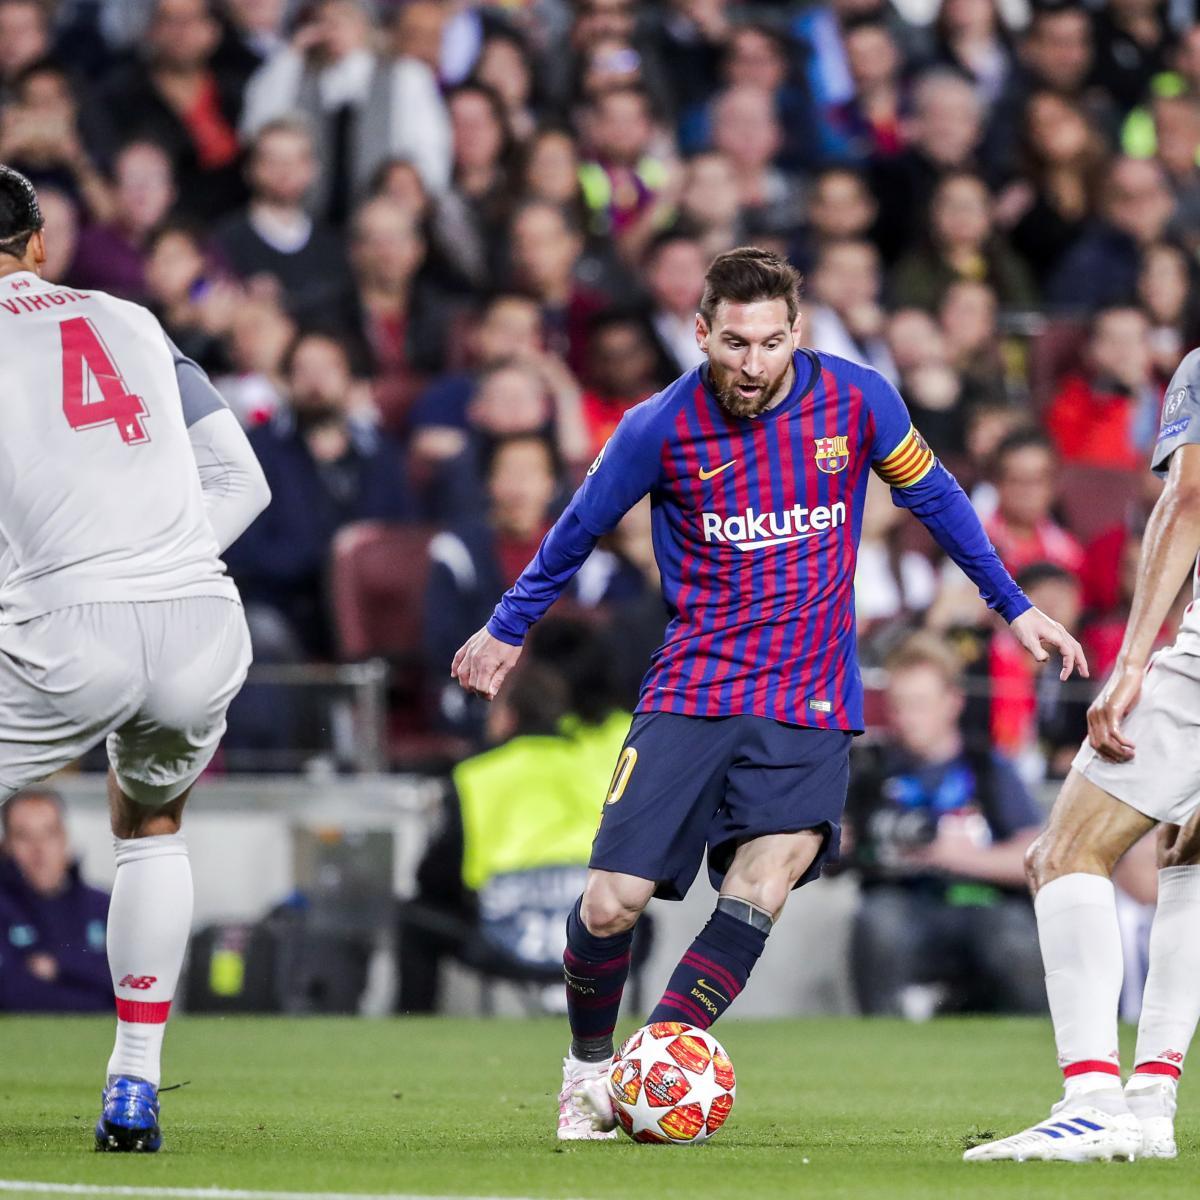 Liverpool Vs. Barcelona: Odds, Live Stream And TV Info For